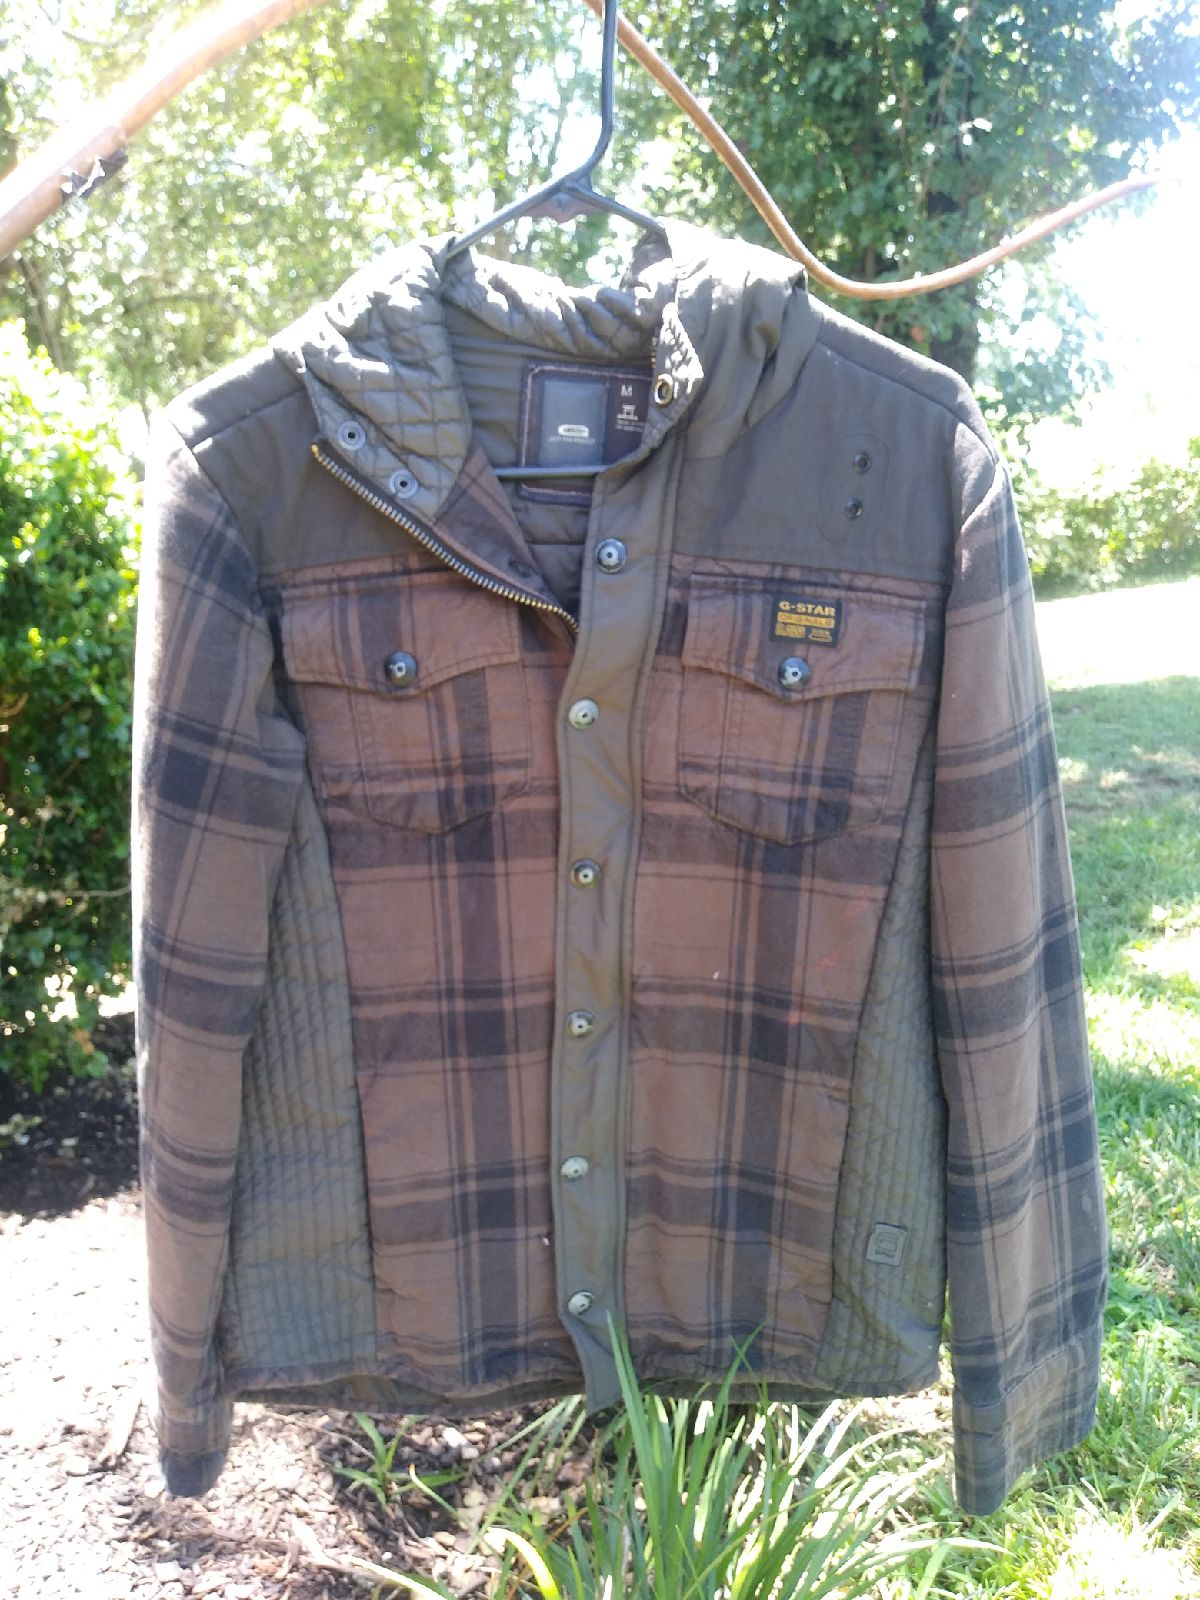 G-Star Raw denim jacket